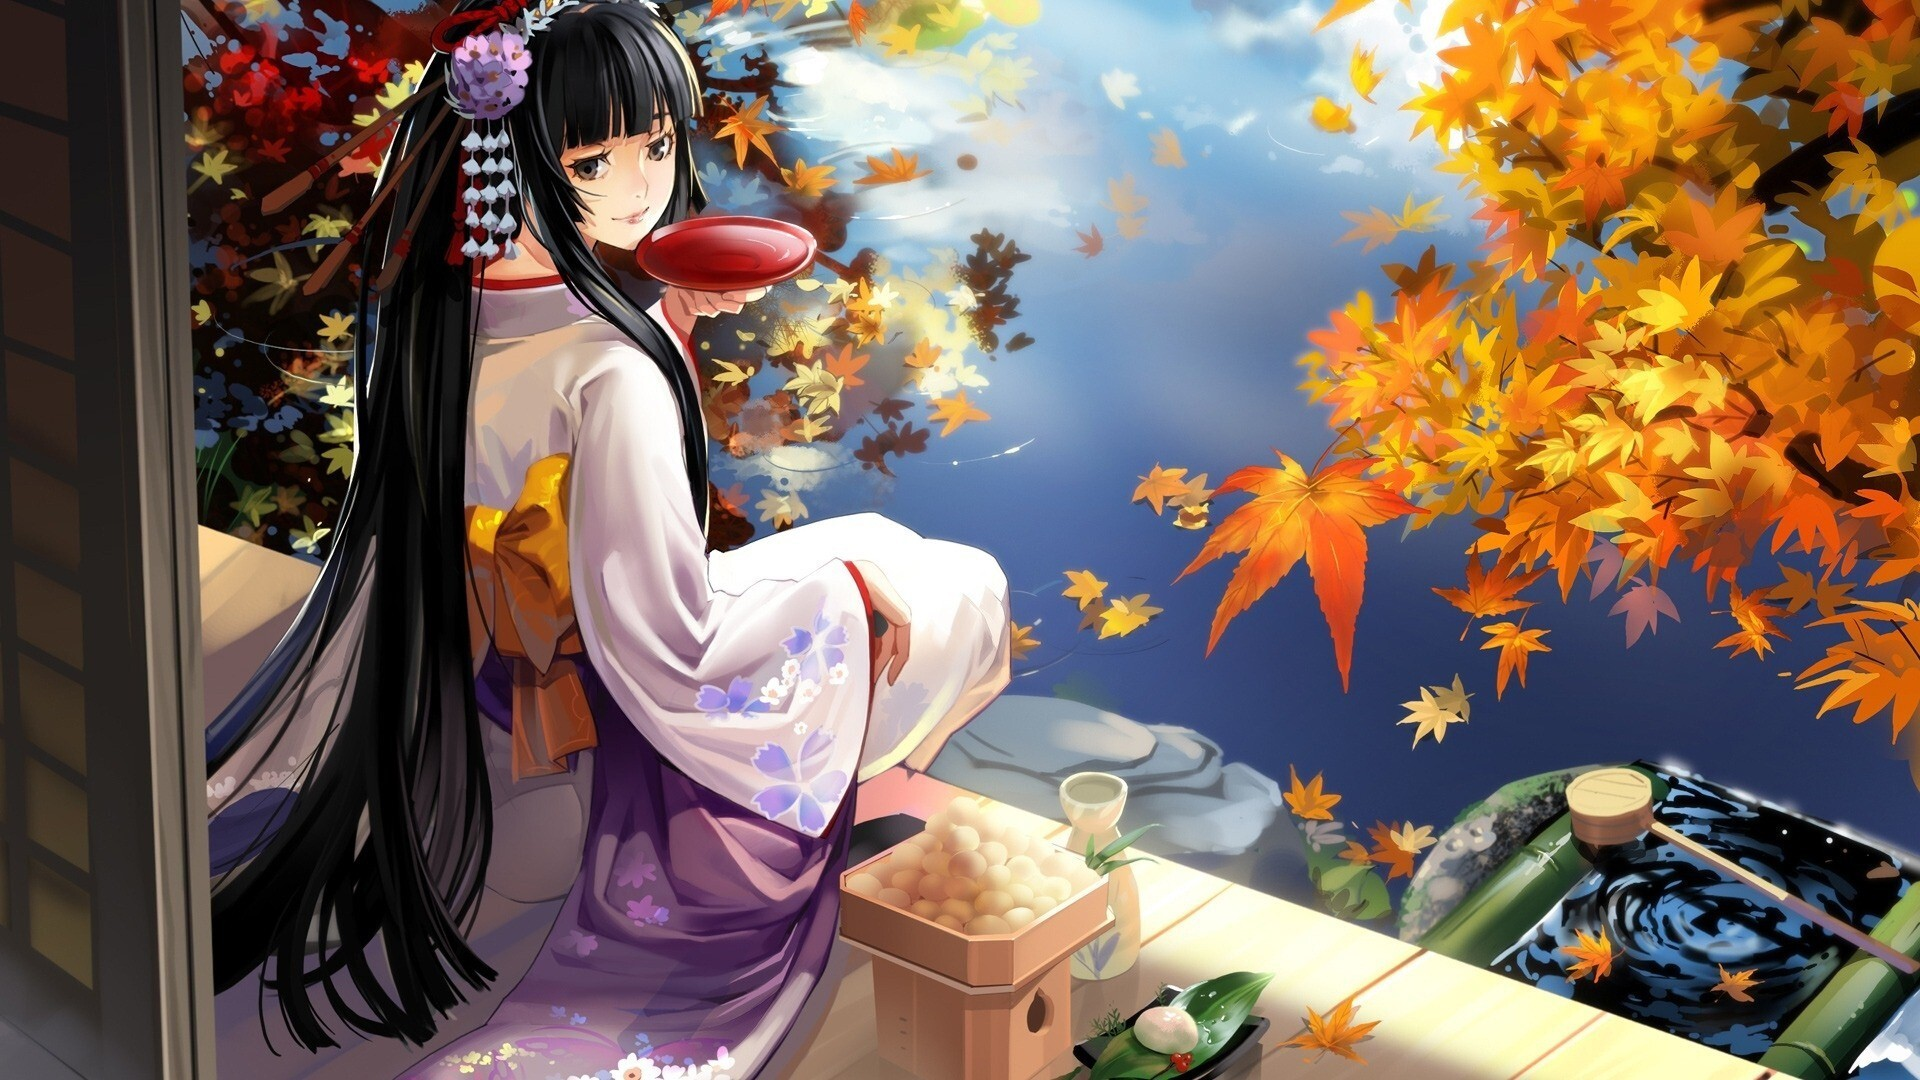 Cute Anime Girl Hd Wallpapers